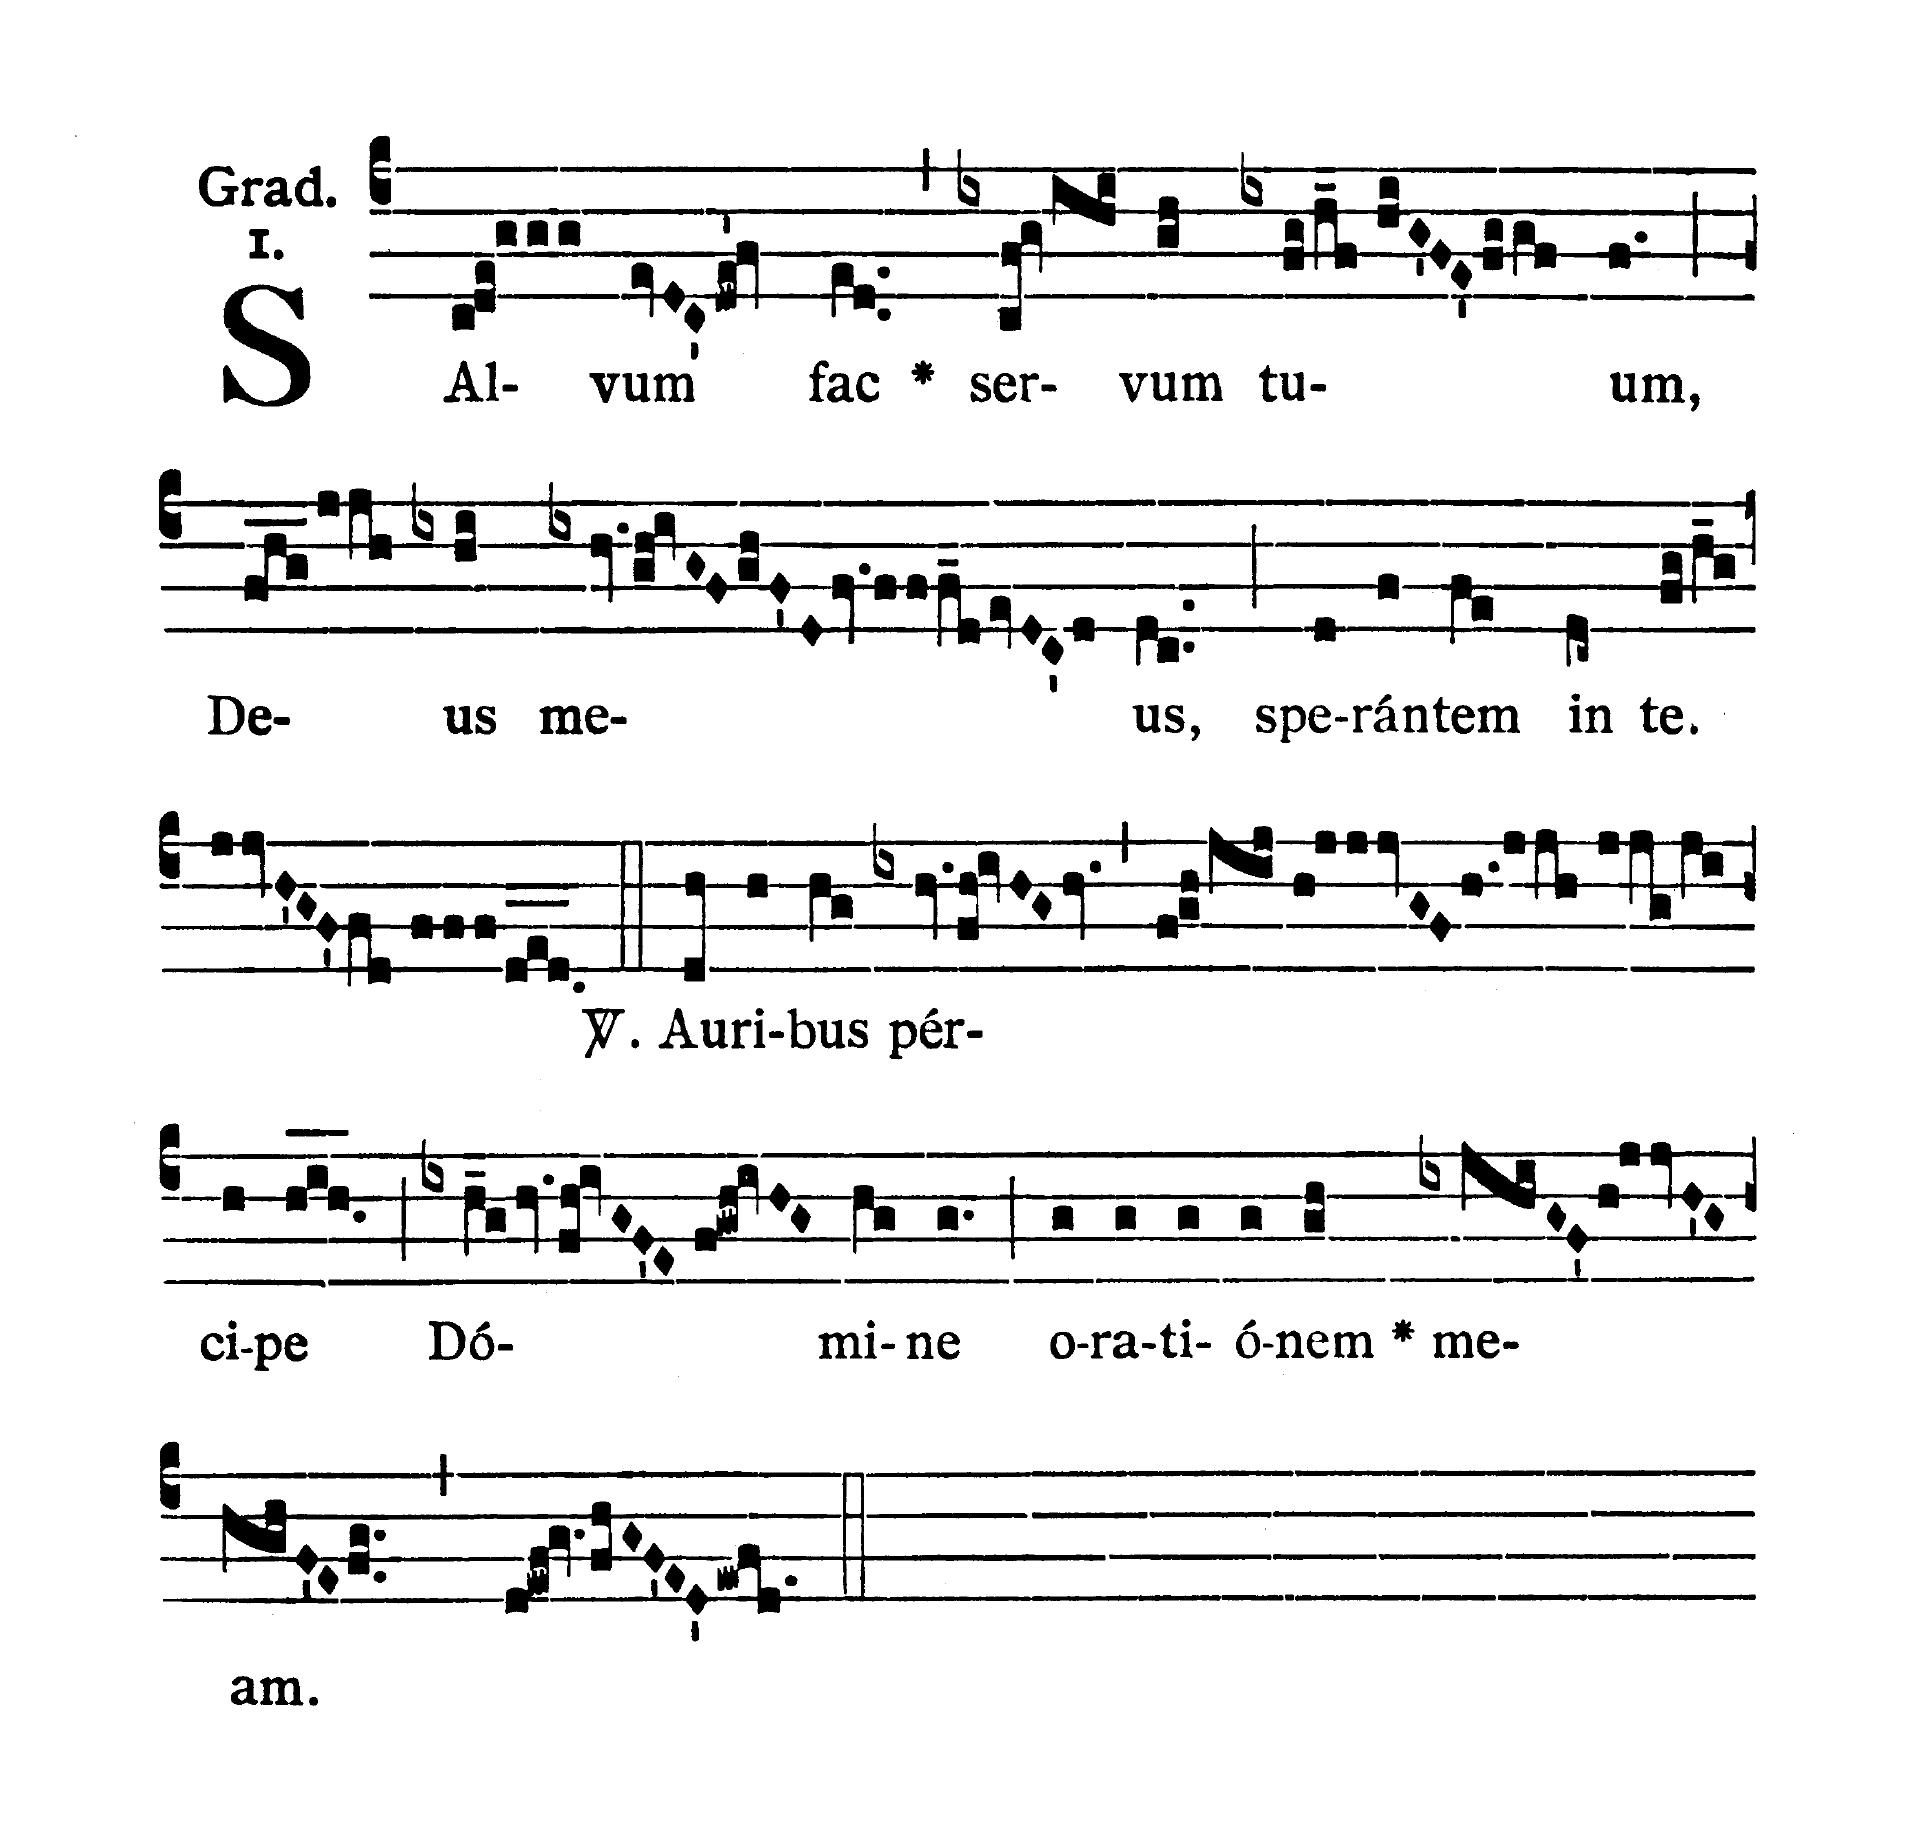 Feria VI Quatuor Temporum Quadragesimae (Piątek suchych dni Wielkiego Postu) - Graduale (Salvum fac)